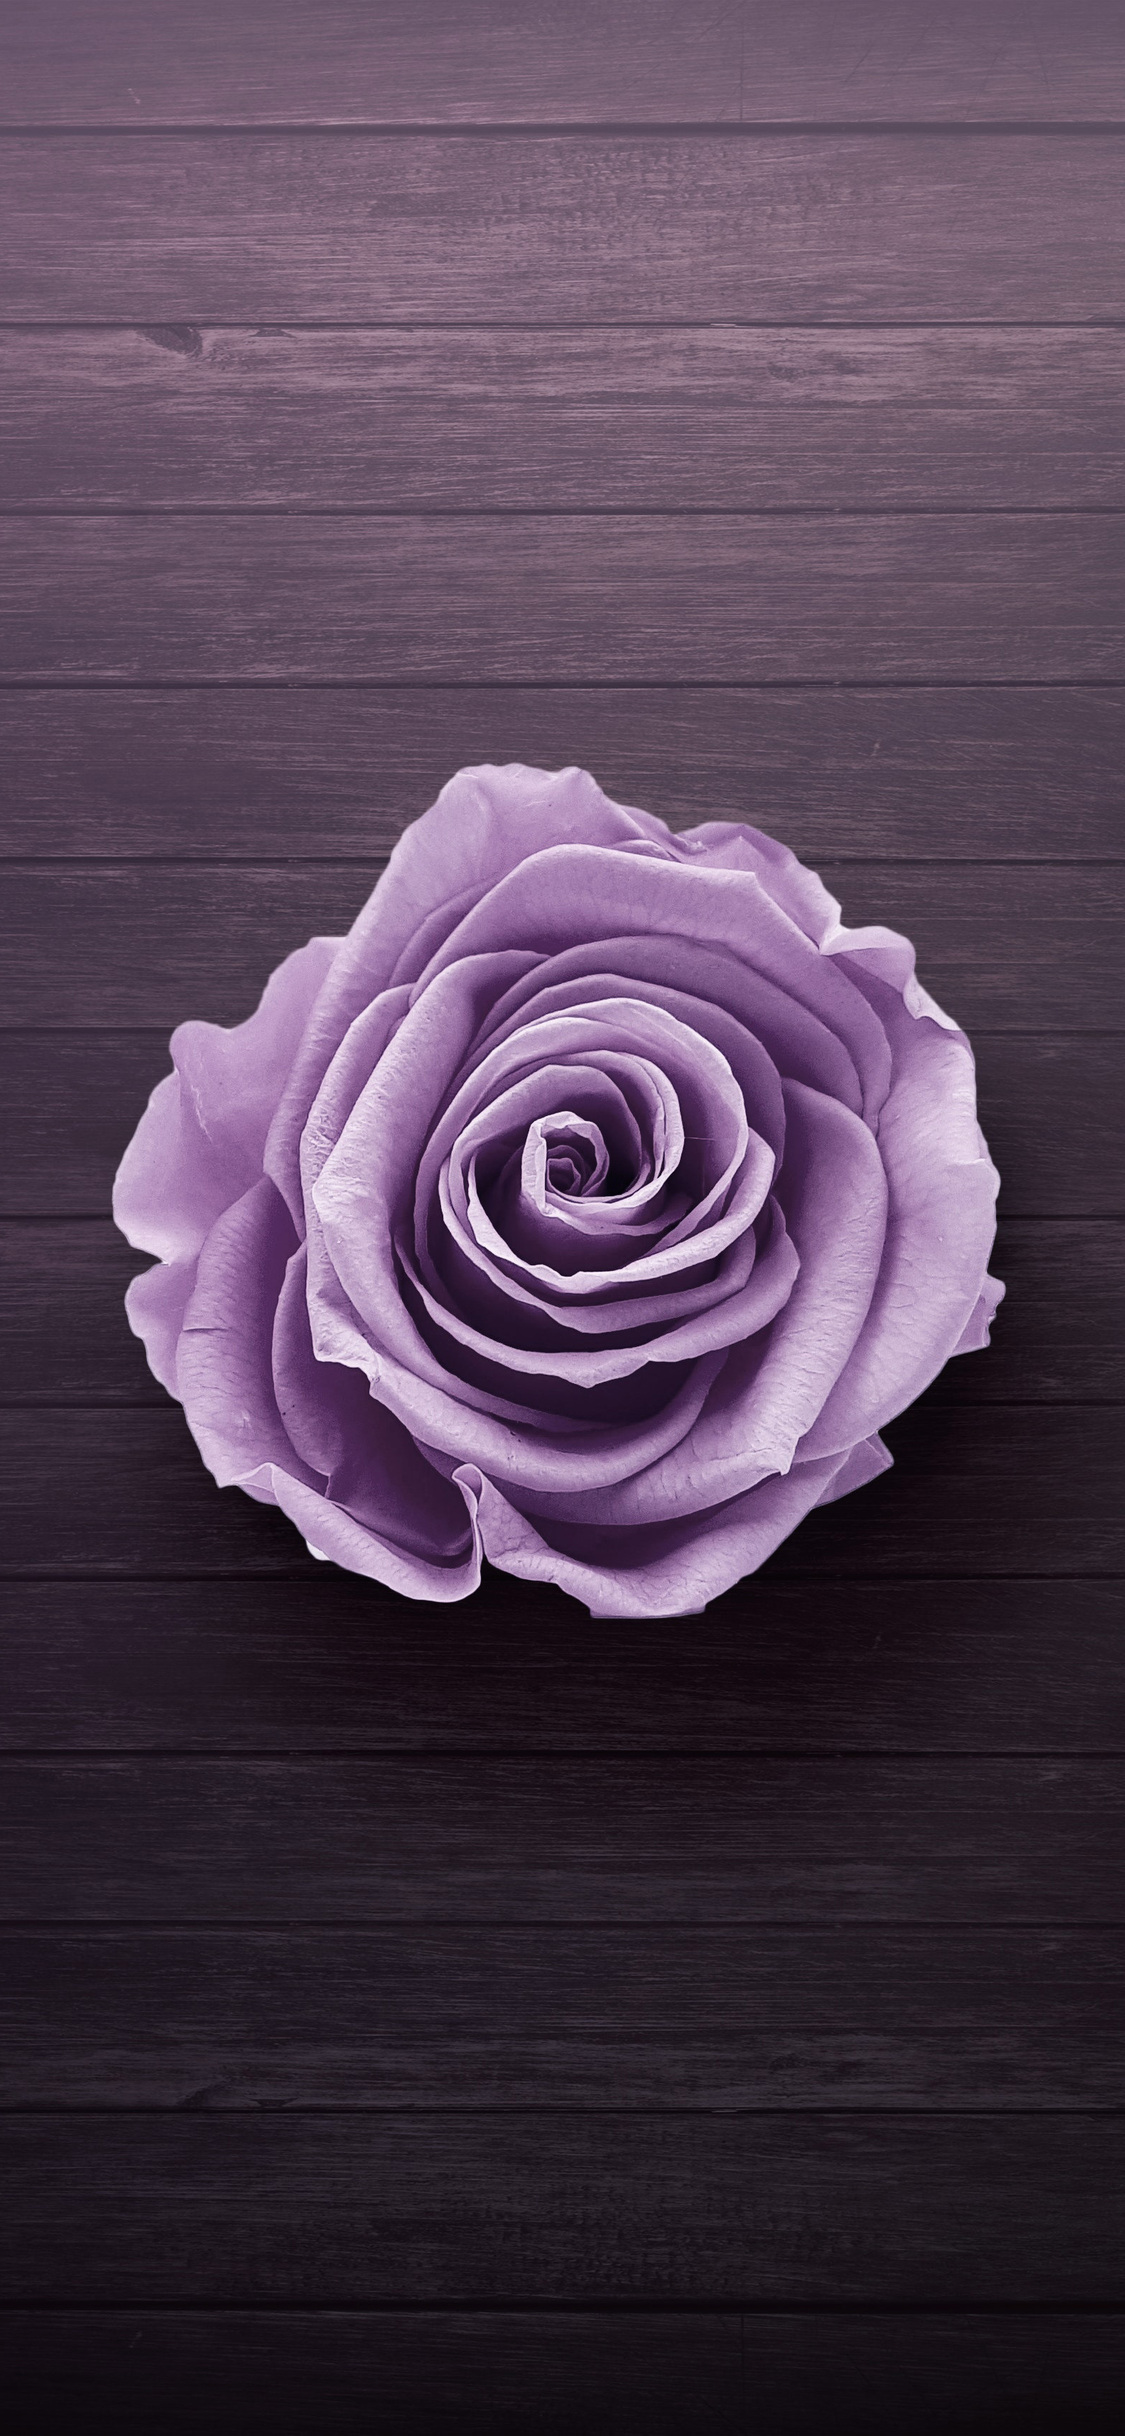 1125x2436 Purple Rose Iphone XS,Iphone 10,Iphone X HD 4k ...